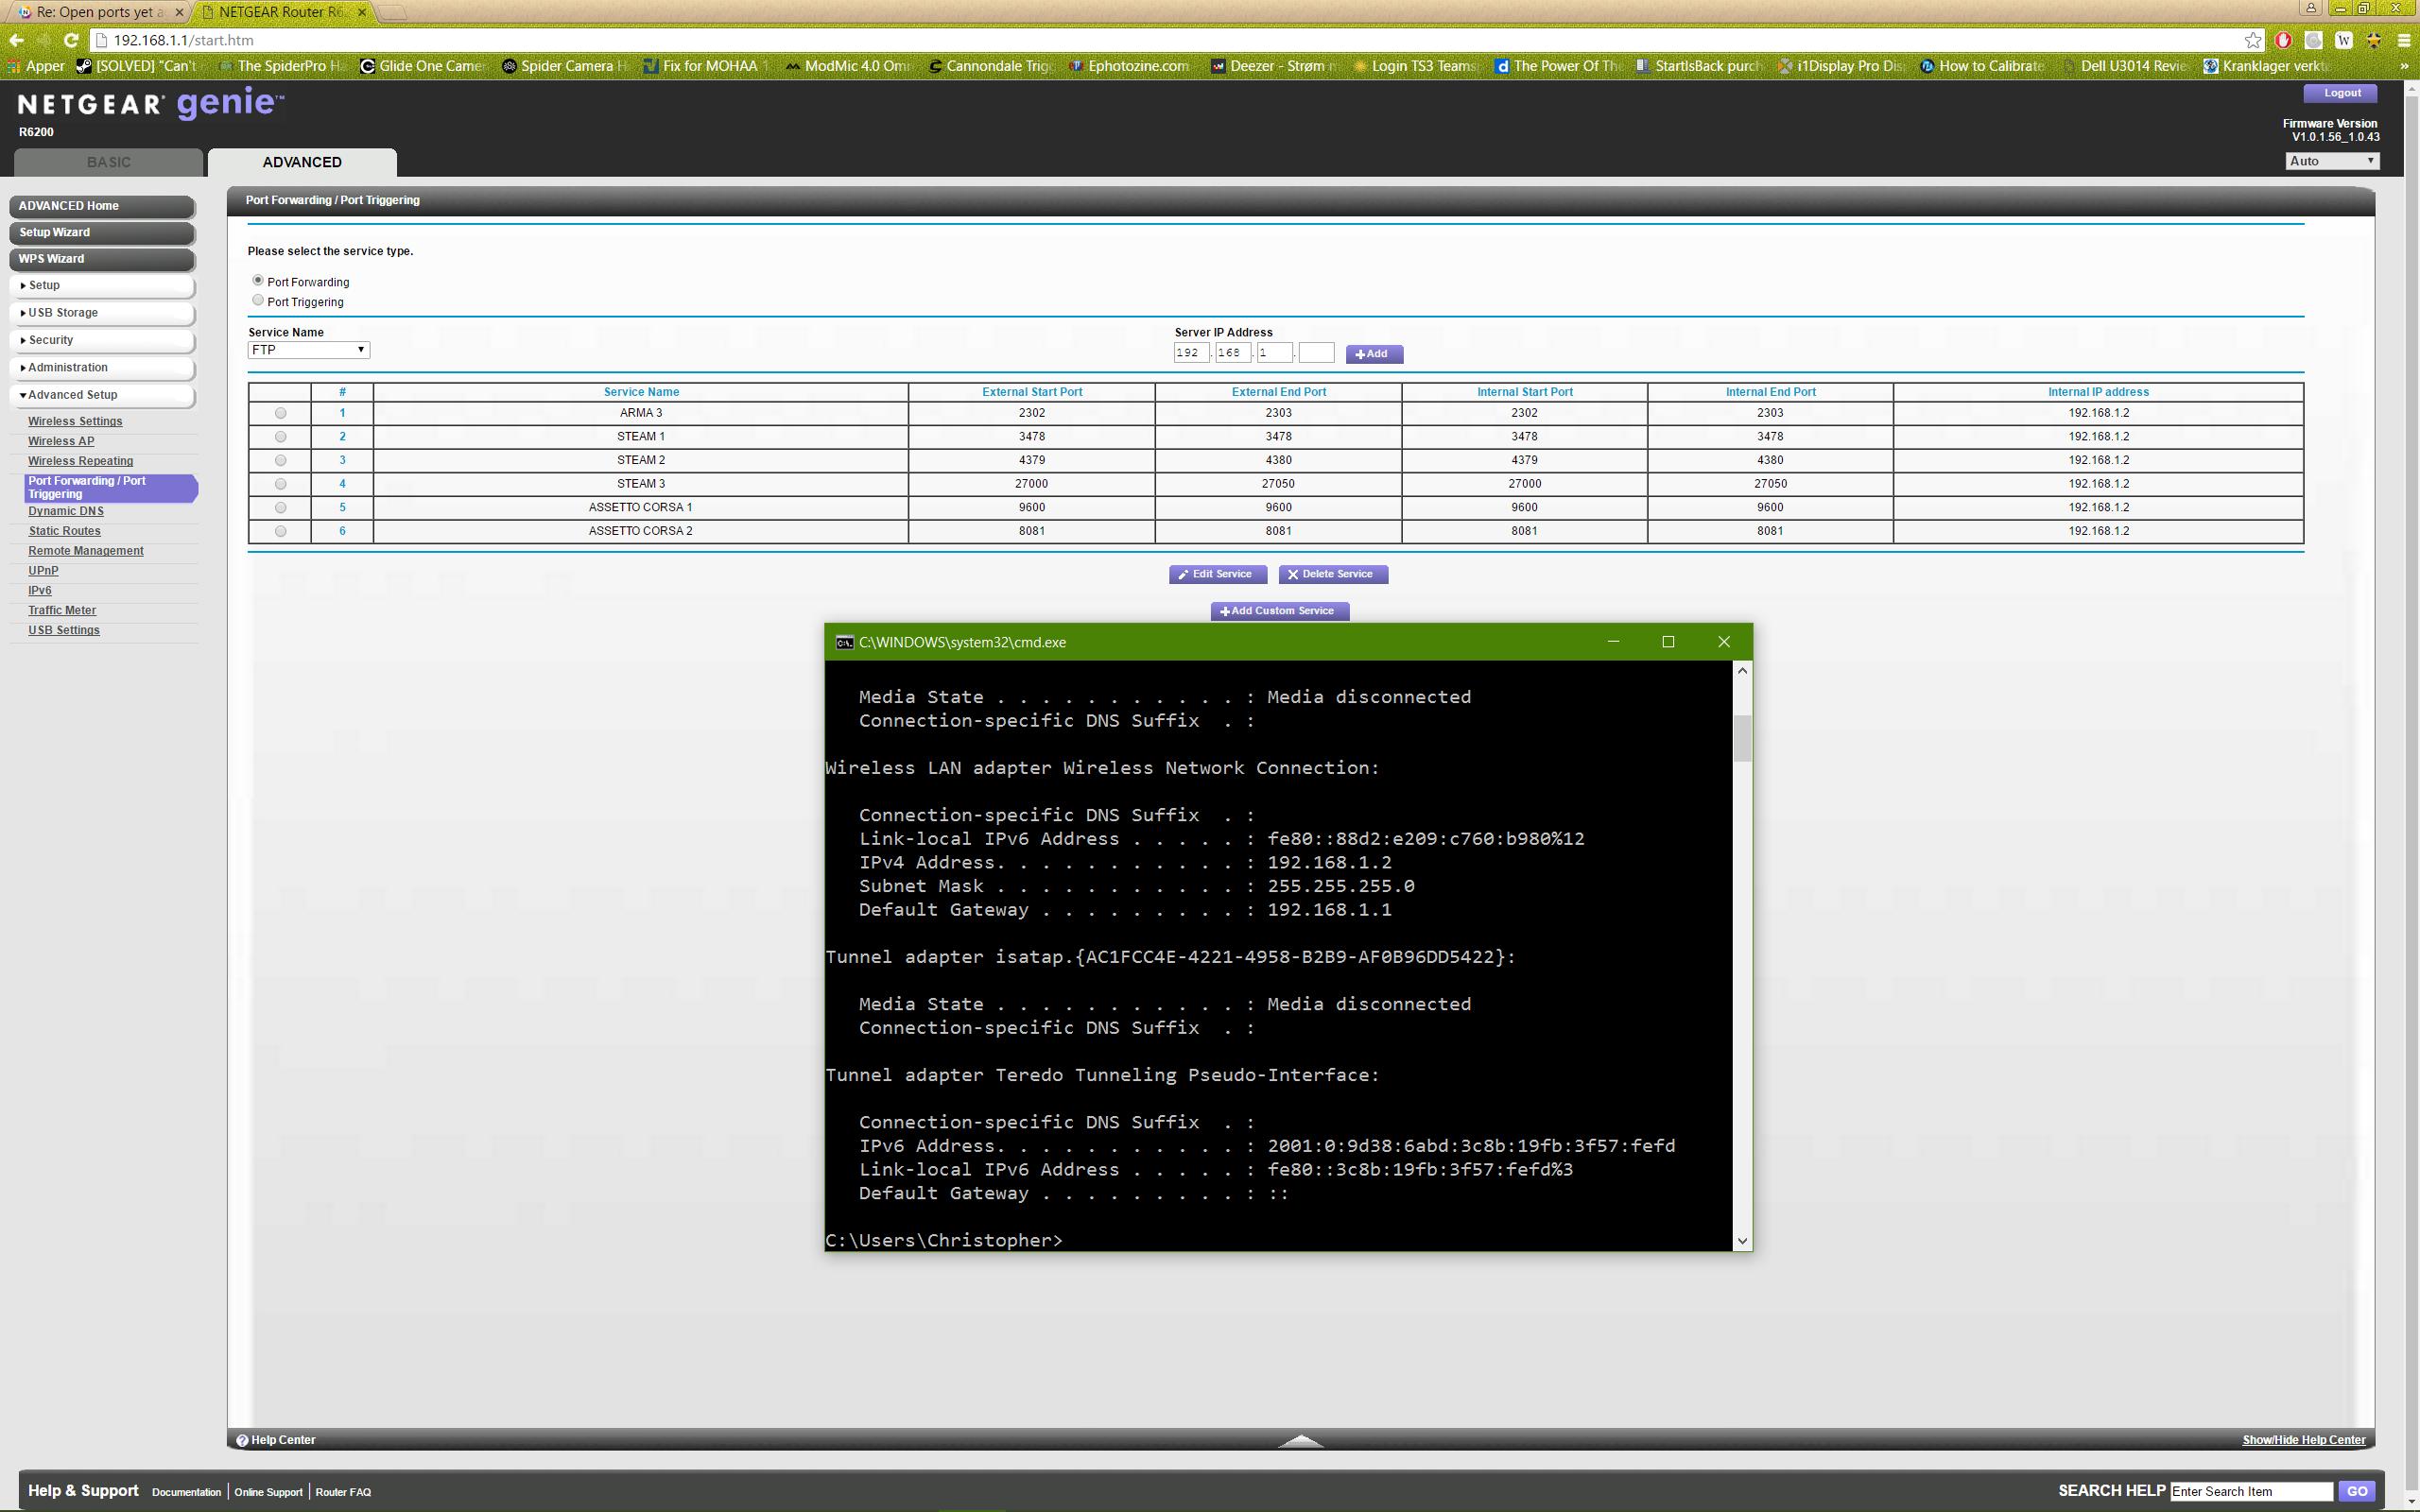 Solved: Open ports yet again - Netgear R6200 - NETGEAR Communities